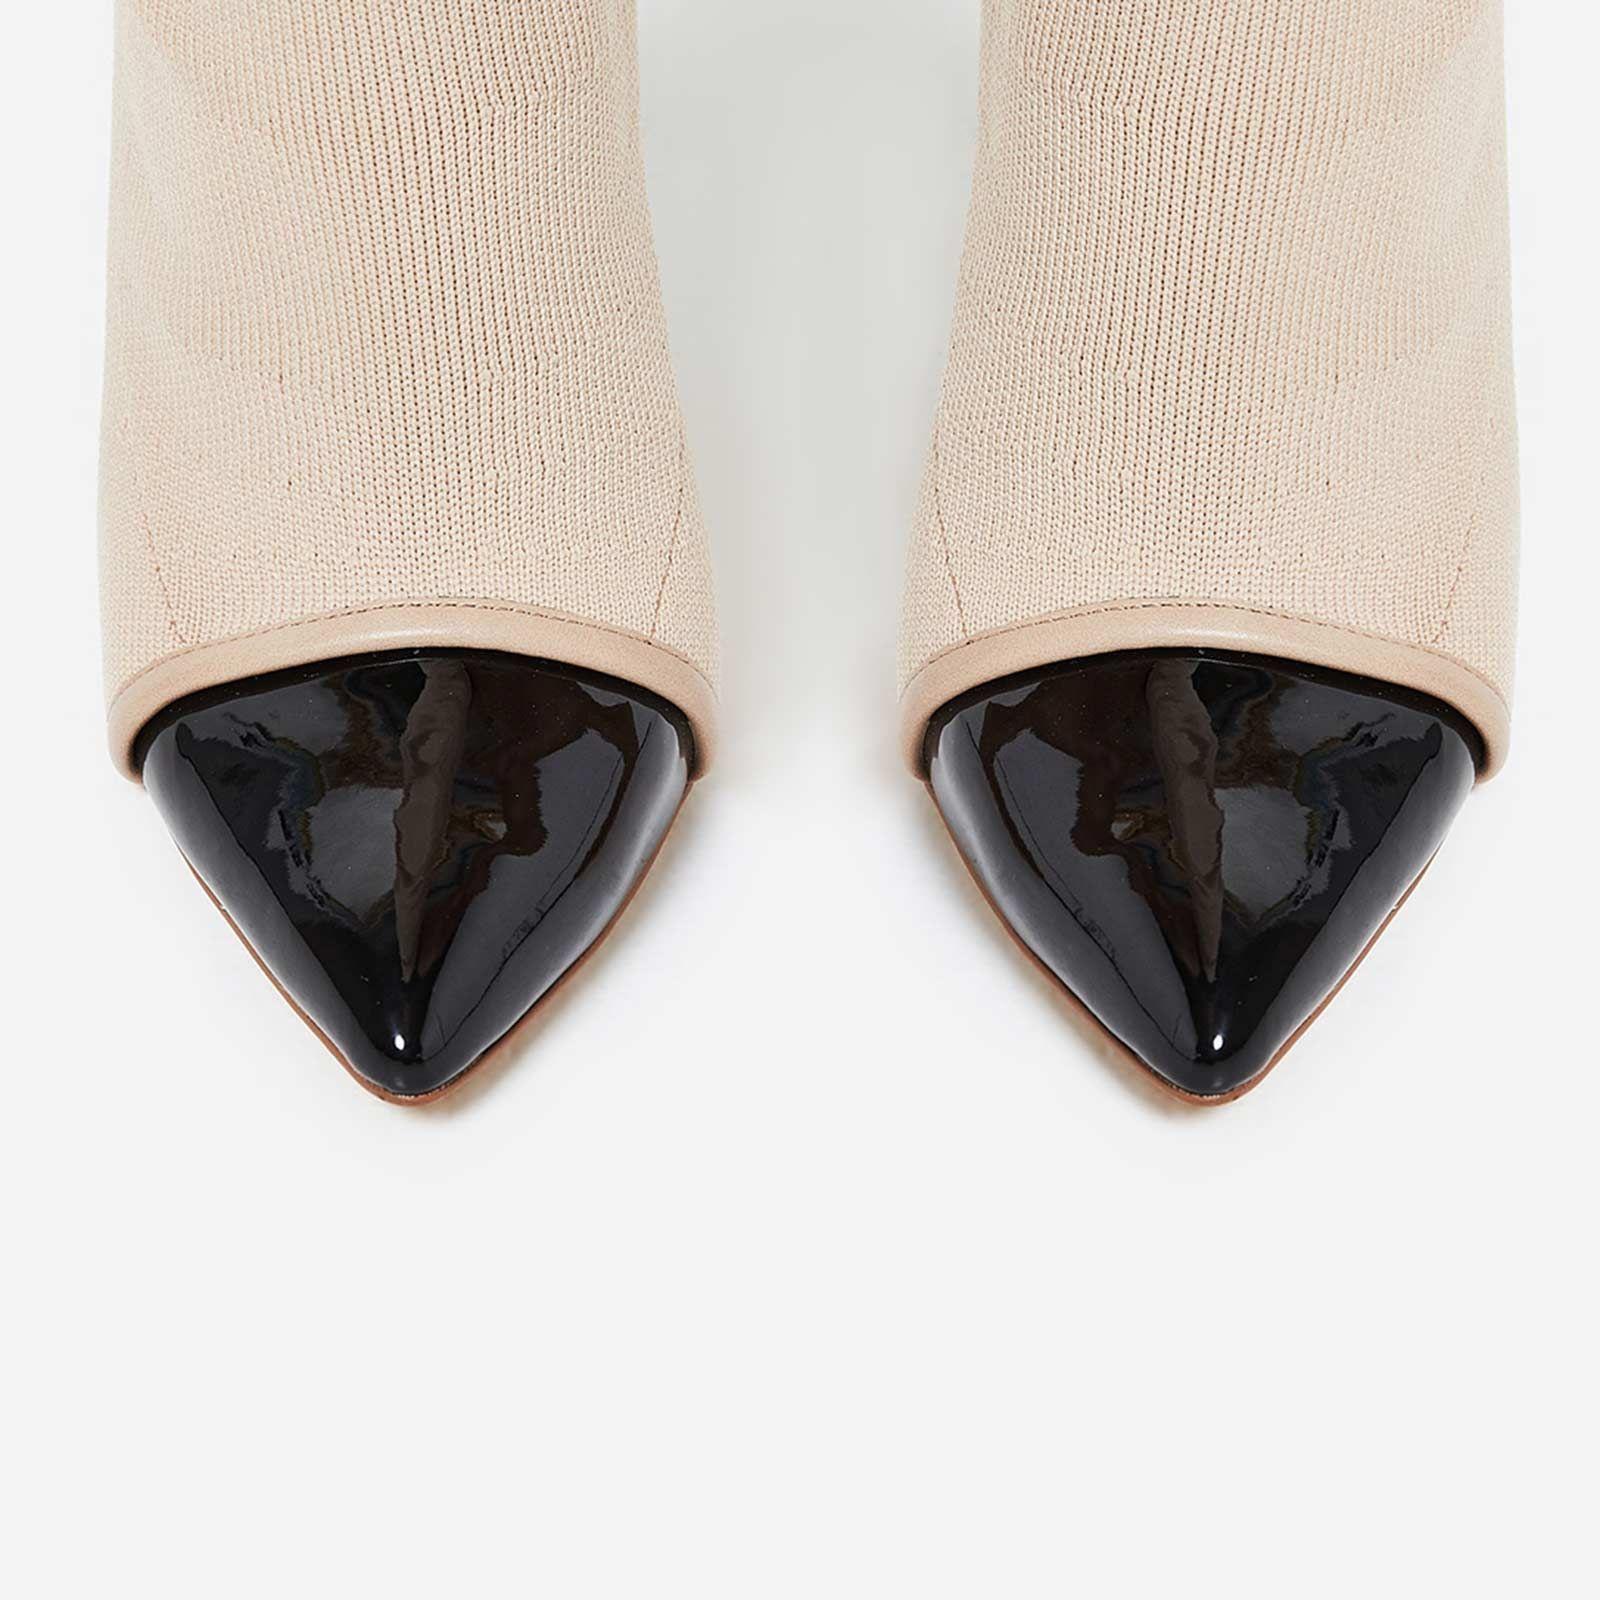 Високи ботуши тип чорап NORMA - бежов